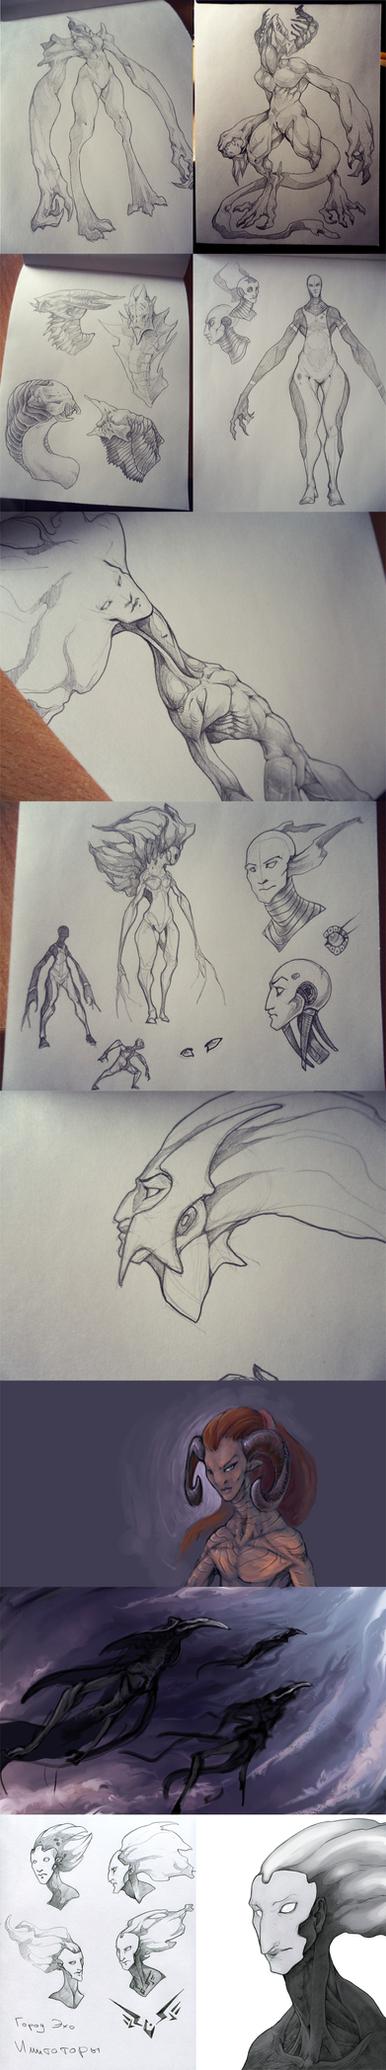 Sketch dump by Ket-DawnAtSunset